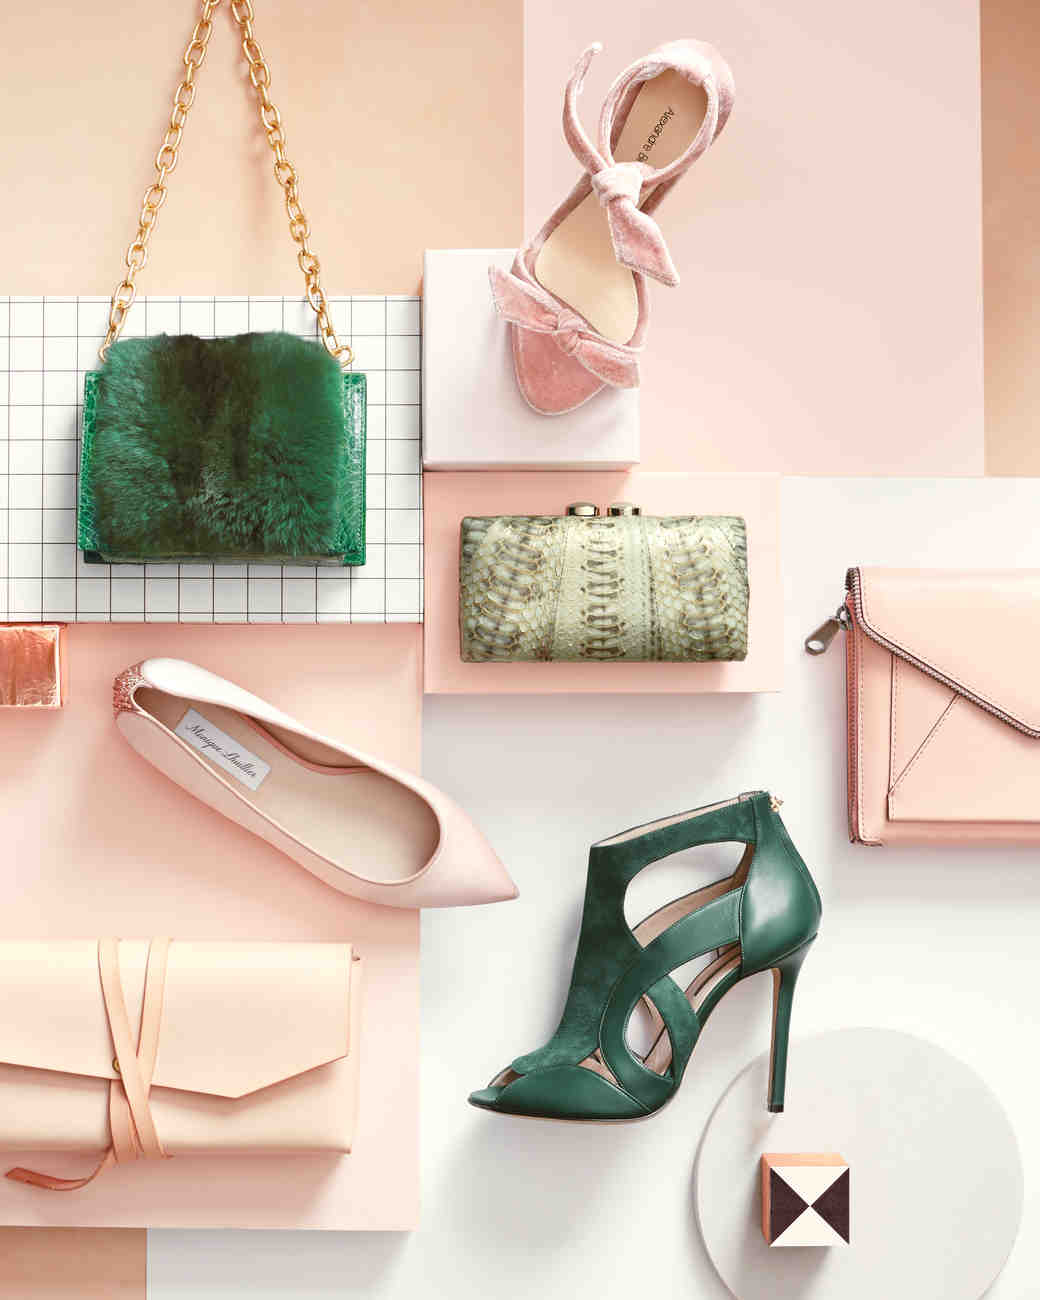 accessories-504-d111274.jpg